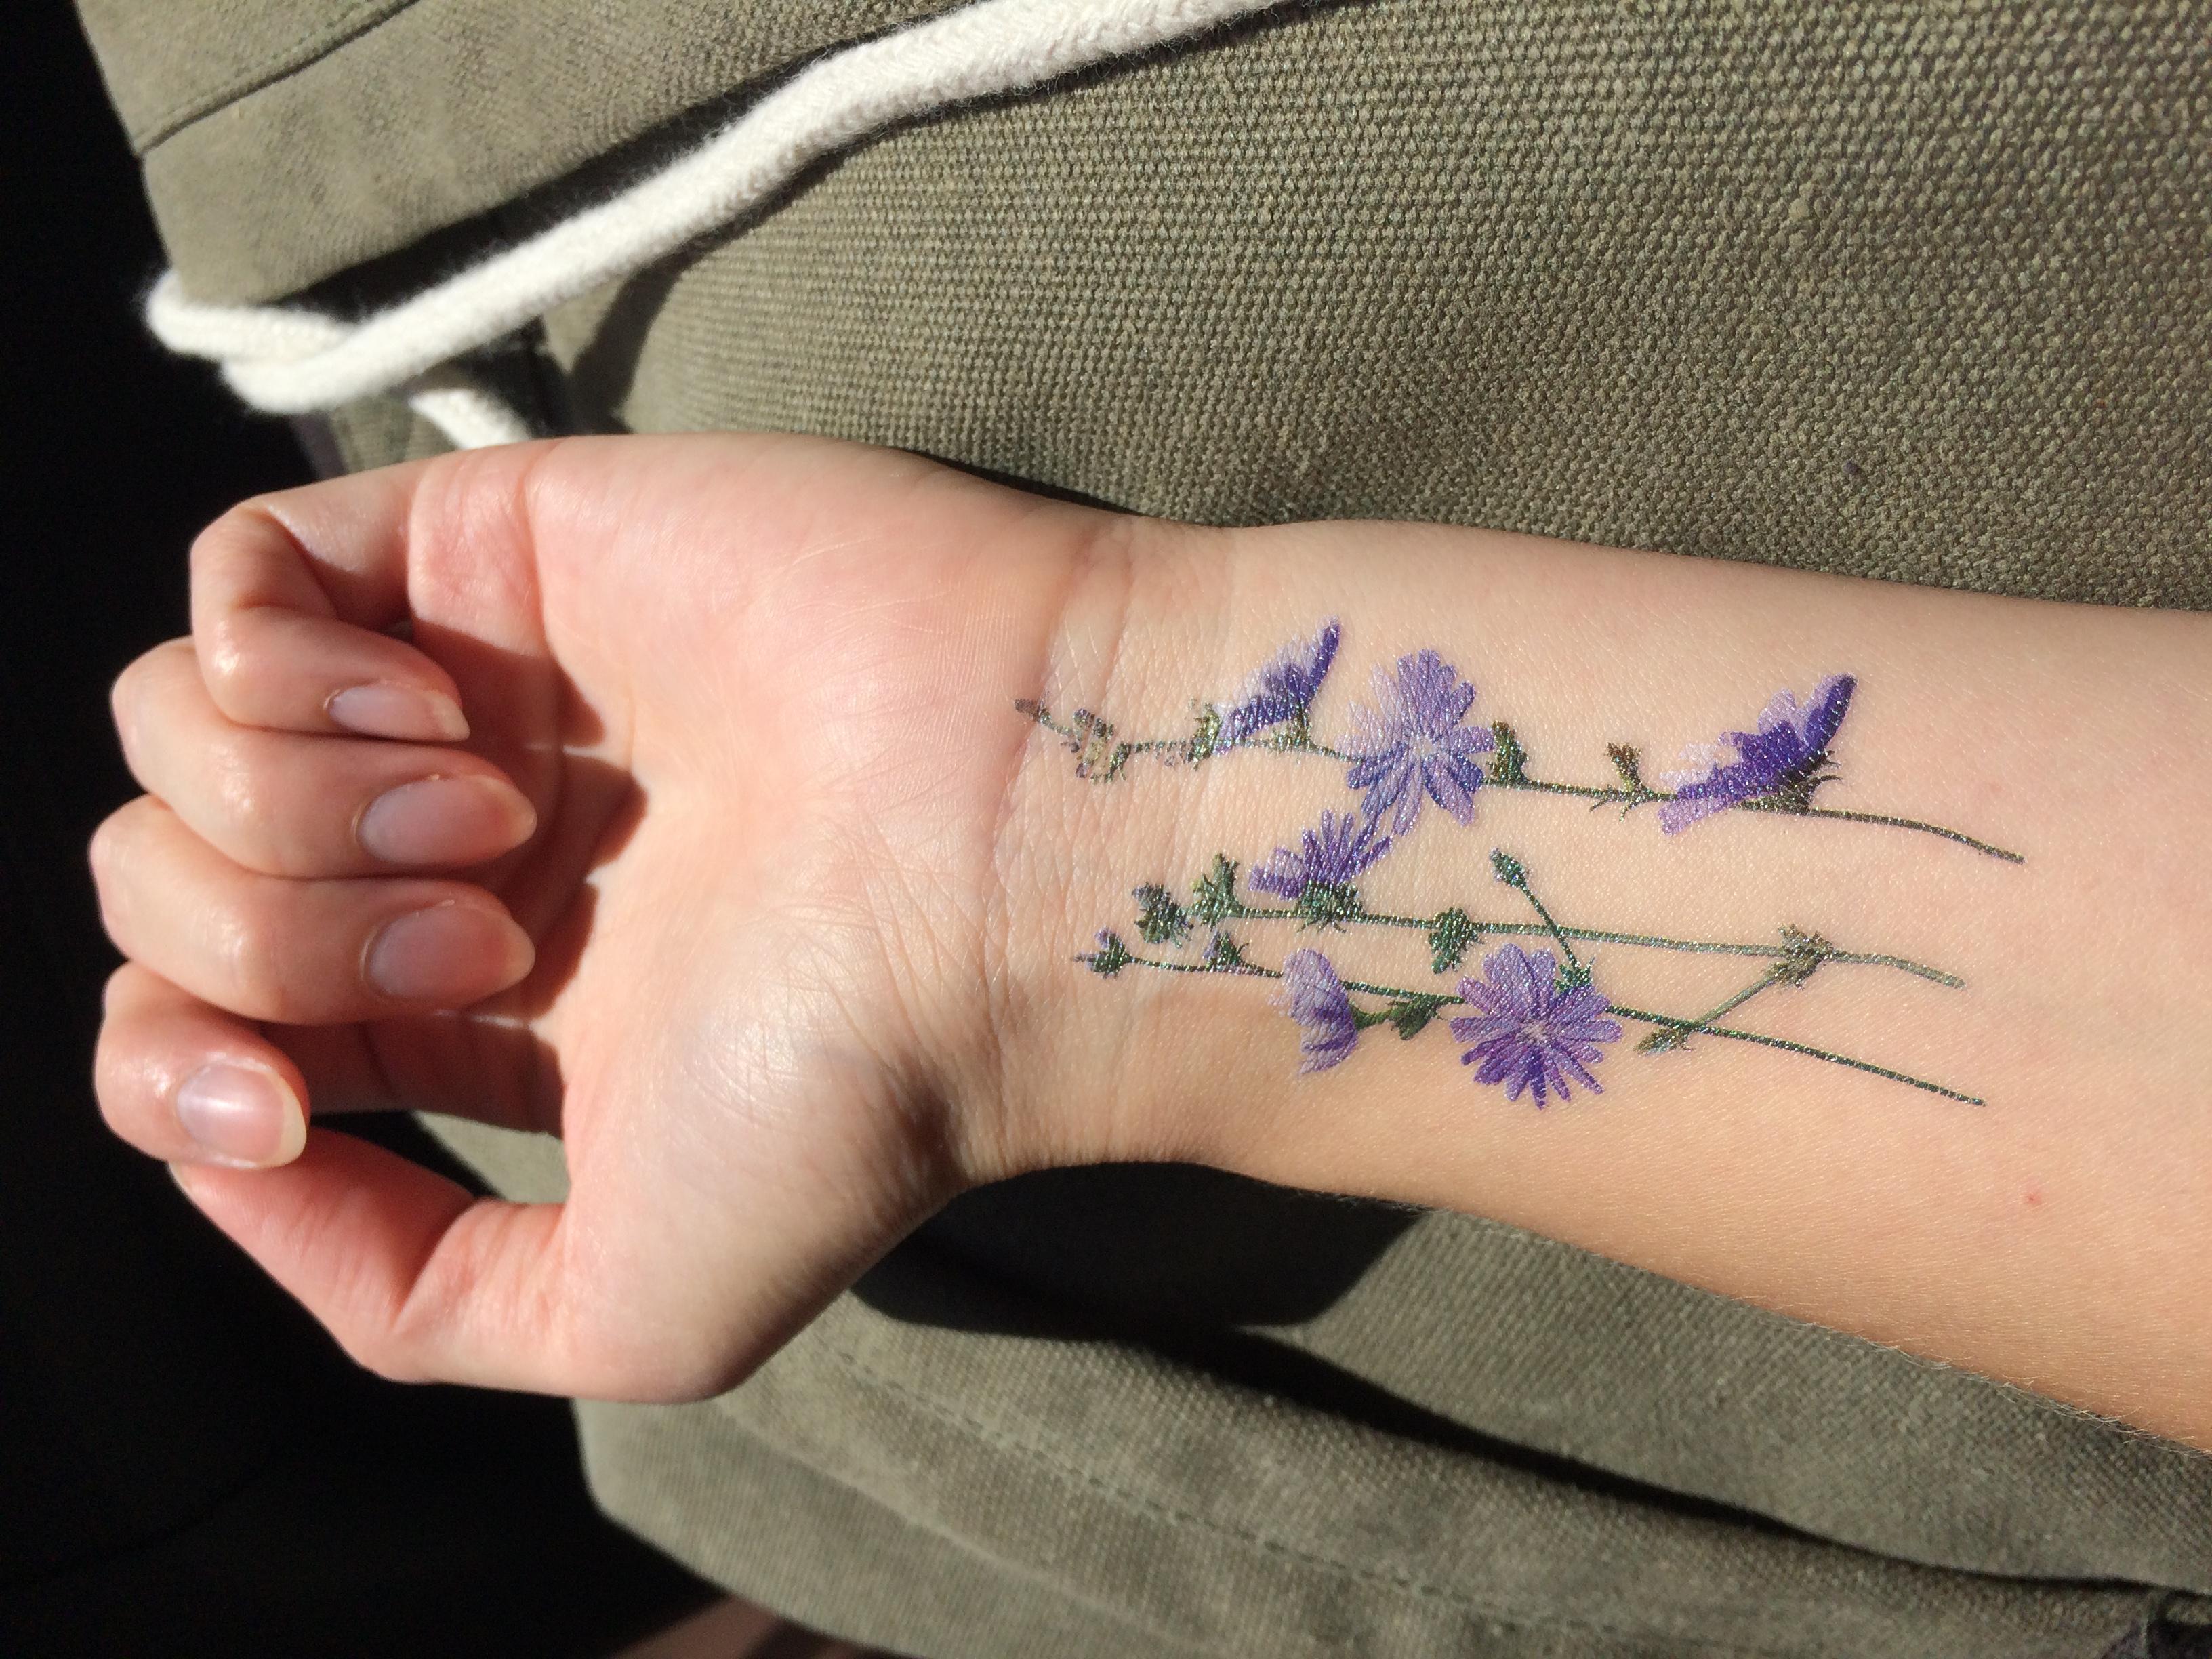 Tatuaże Las I Niebo Córka Leśników